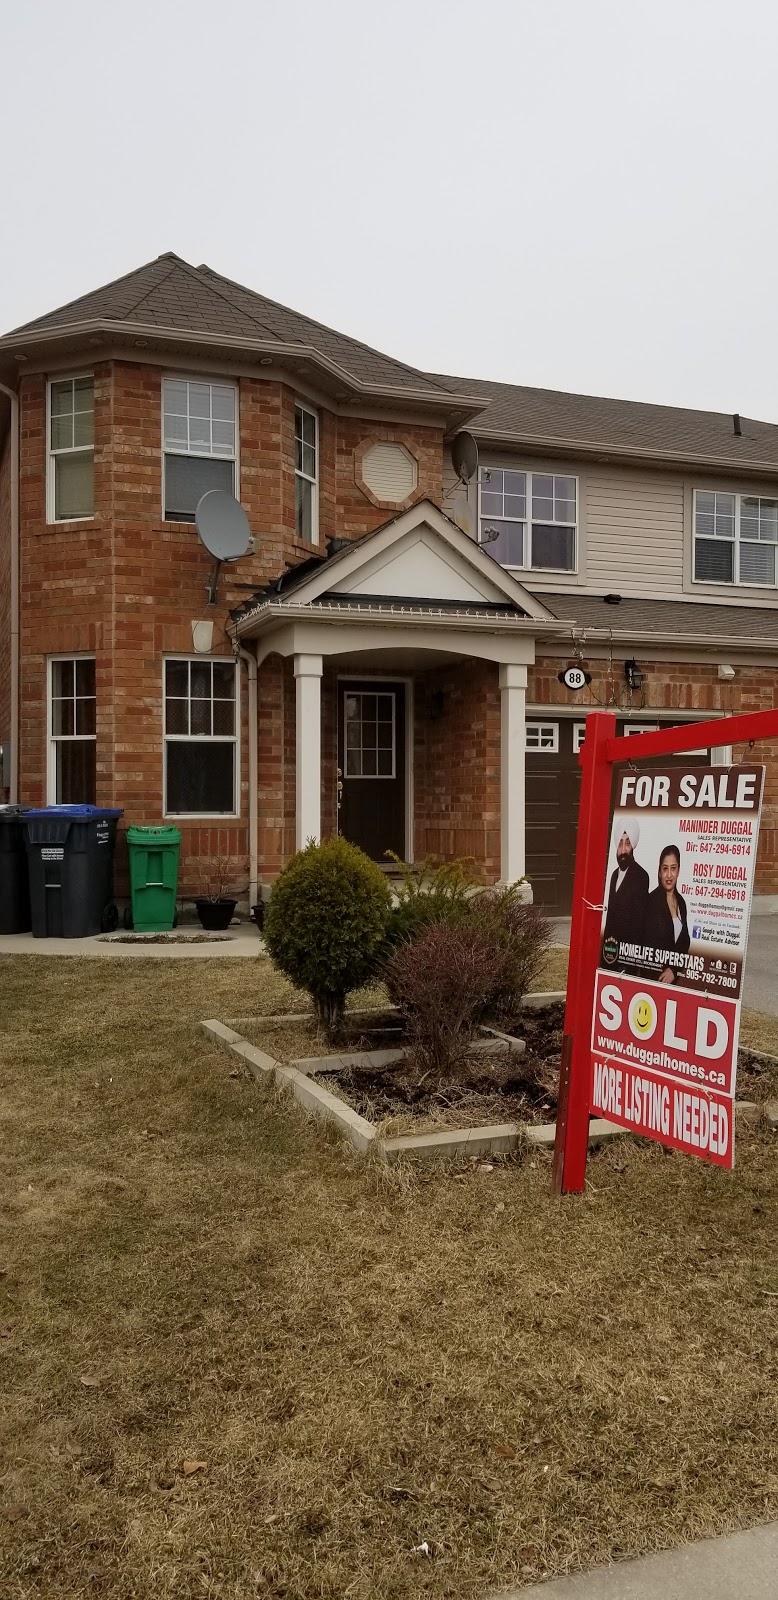 Maninder Singh Duggal Realtor | real estate agency | 23 Westmore Dr, Etobicoke, ON M9V 3Y6, Canada | 6472946914 OR +1 647-294-6914